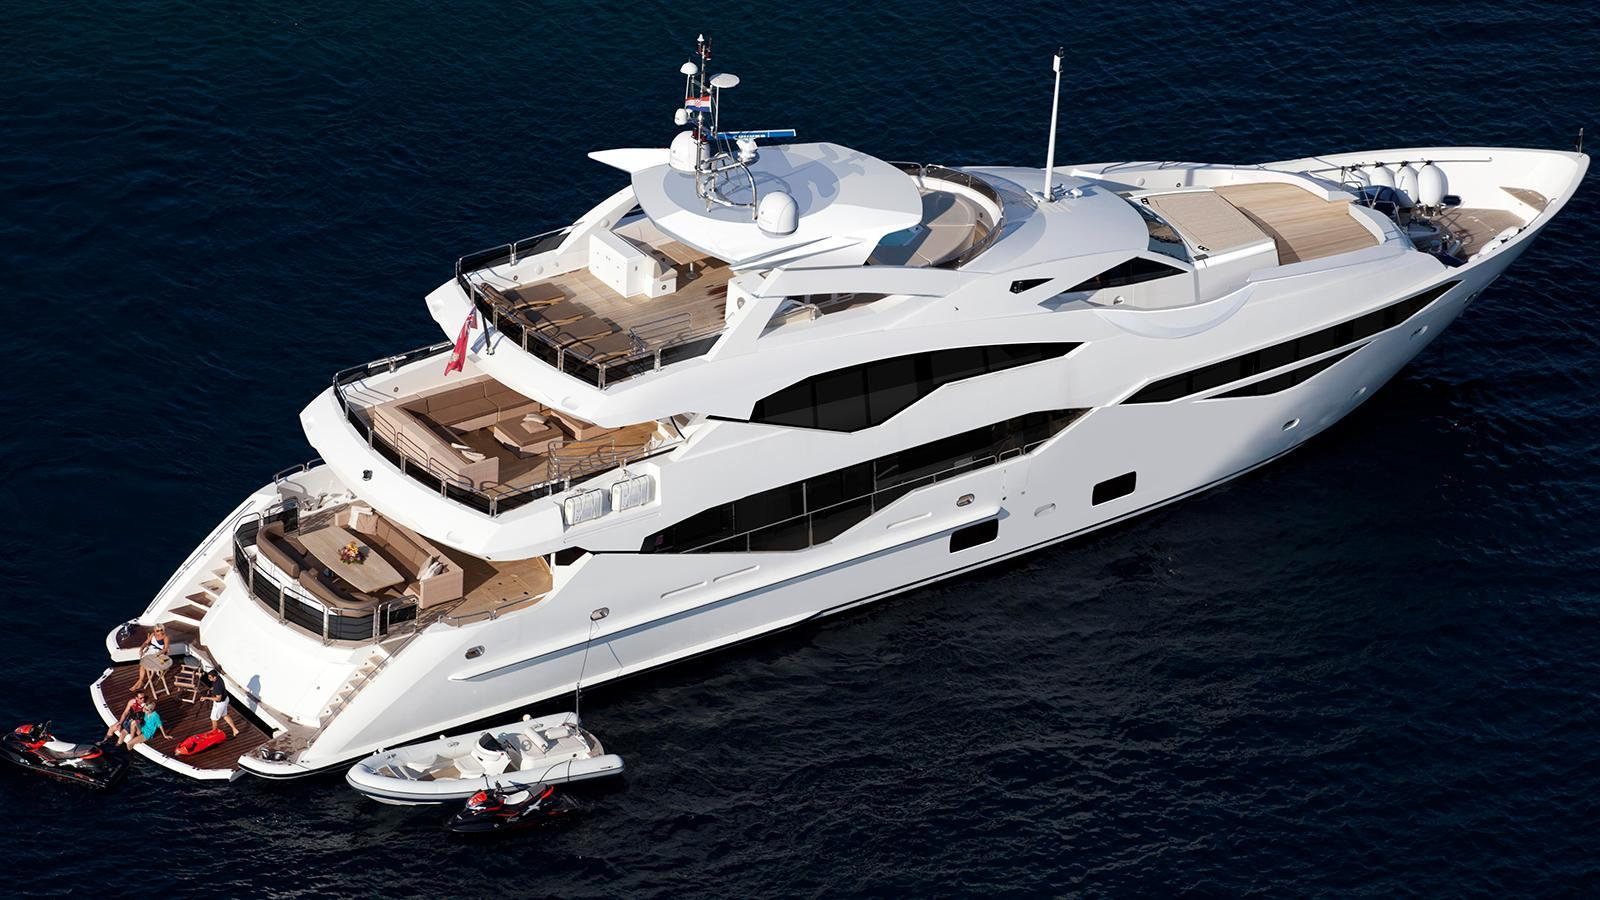 sh magic sunseeker 131 yacht 40m 2018 aerial sistership